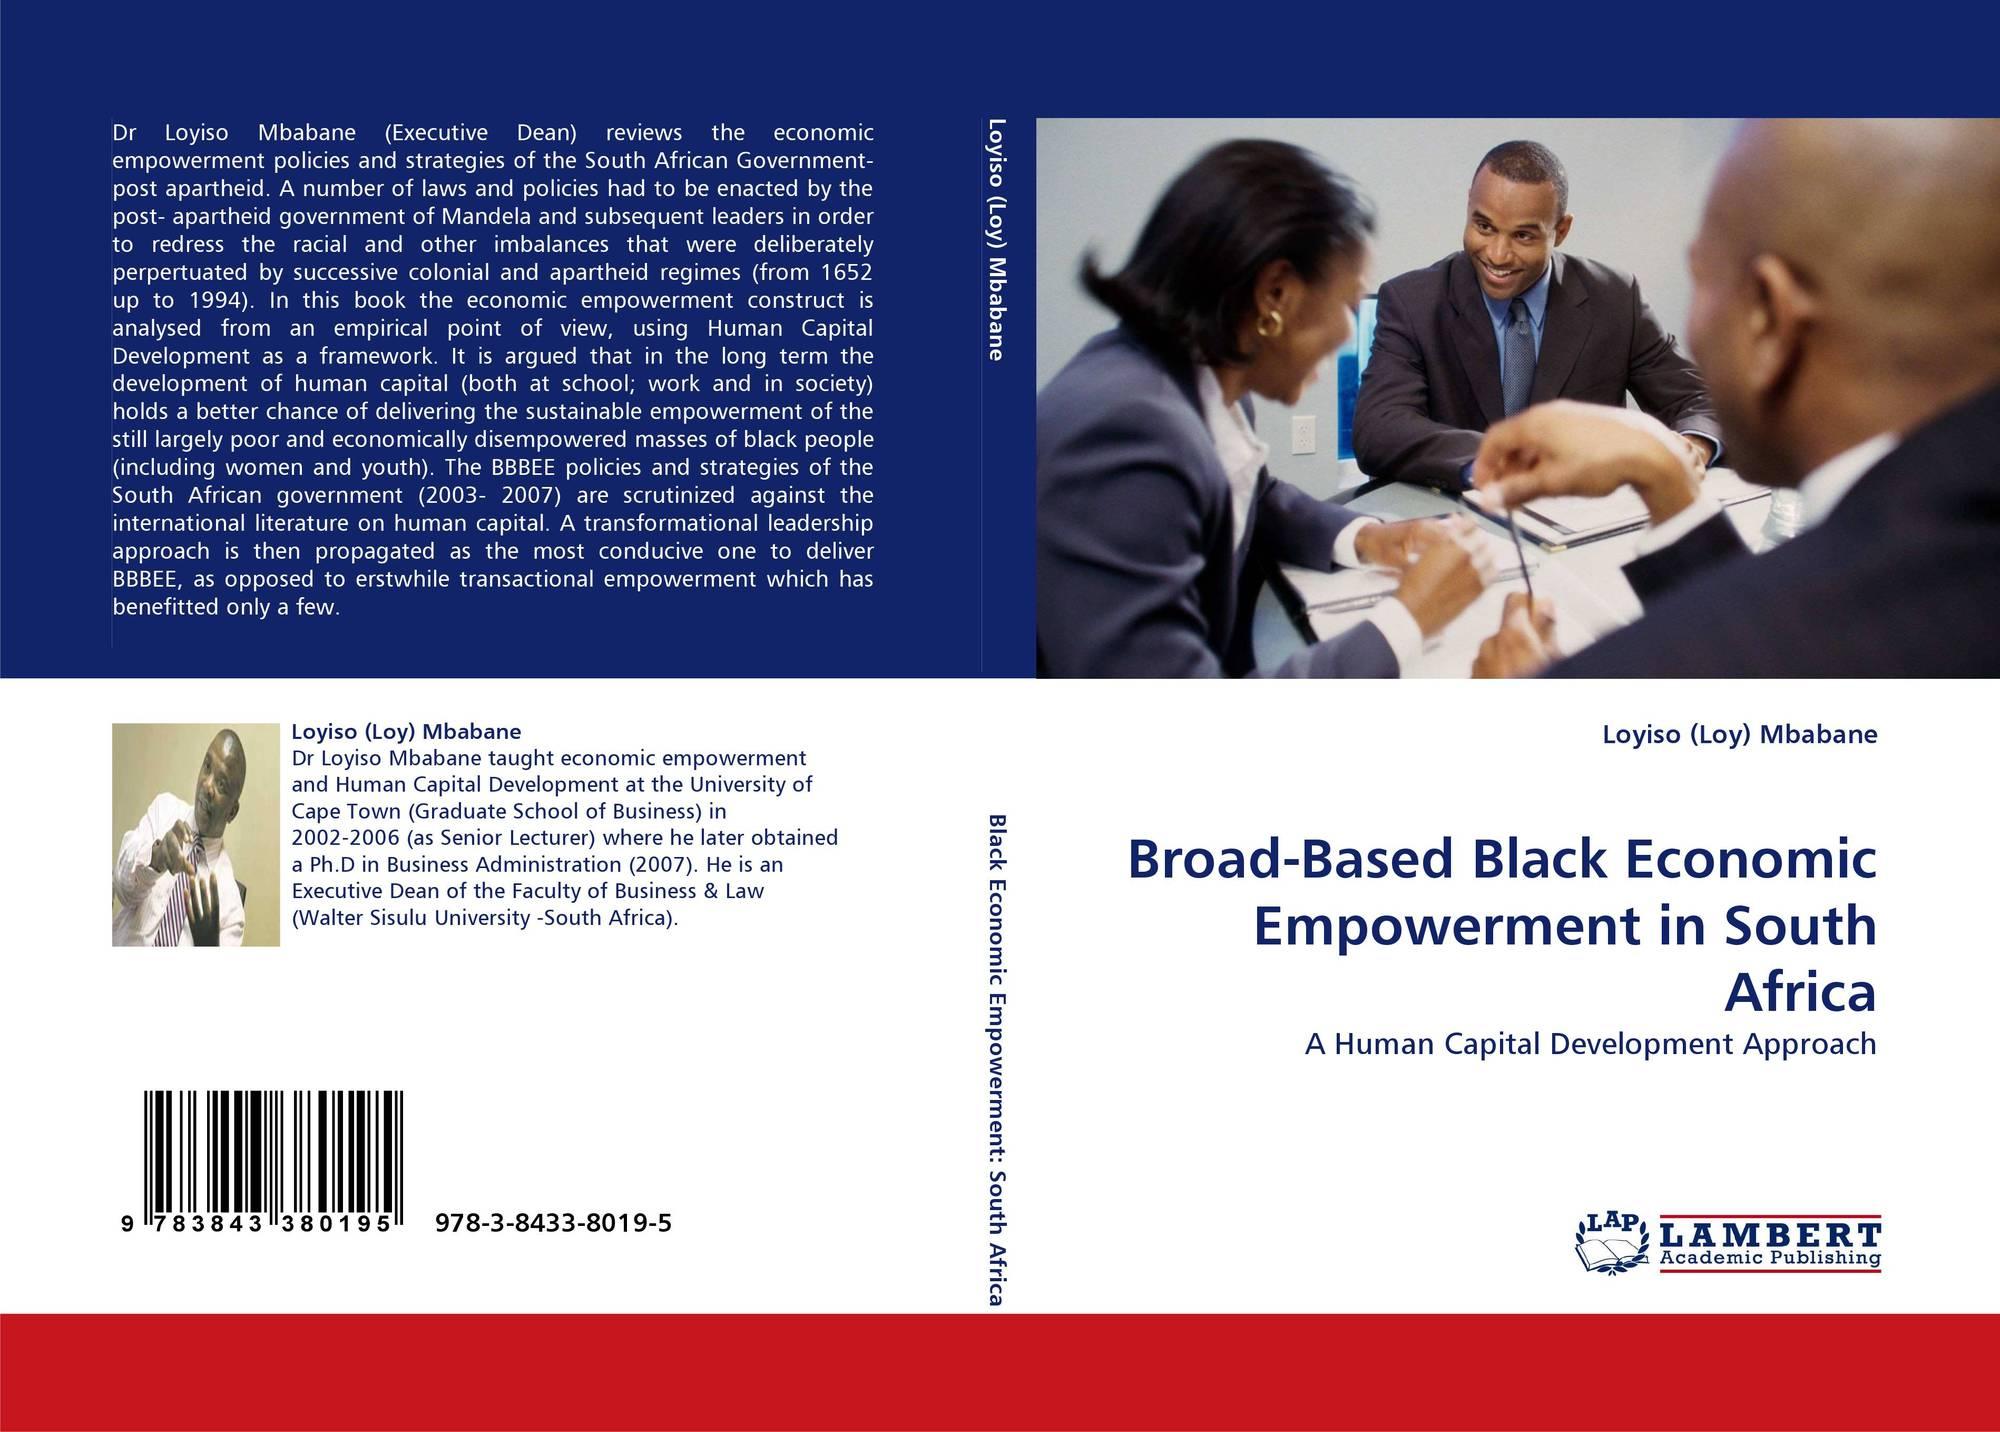 dissertation on black economic empowerment Duflo e (2011) women's empowerment and economic development, national bureau of economic research.